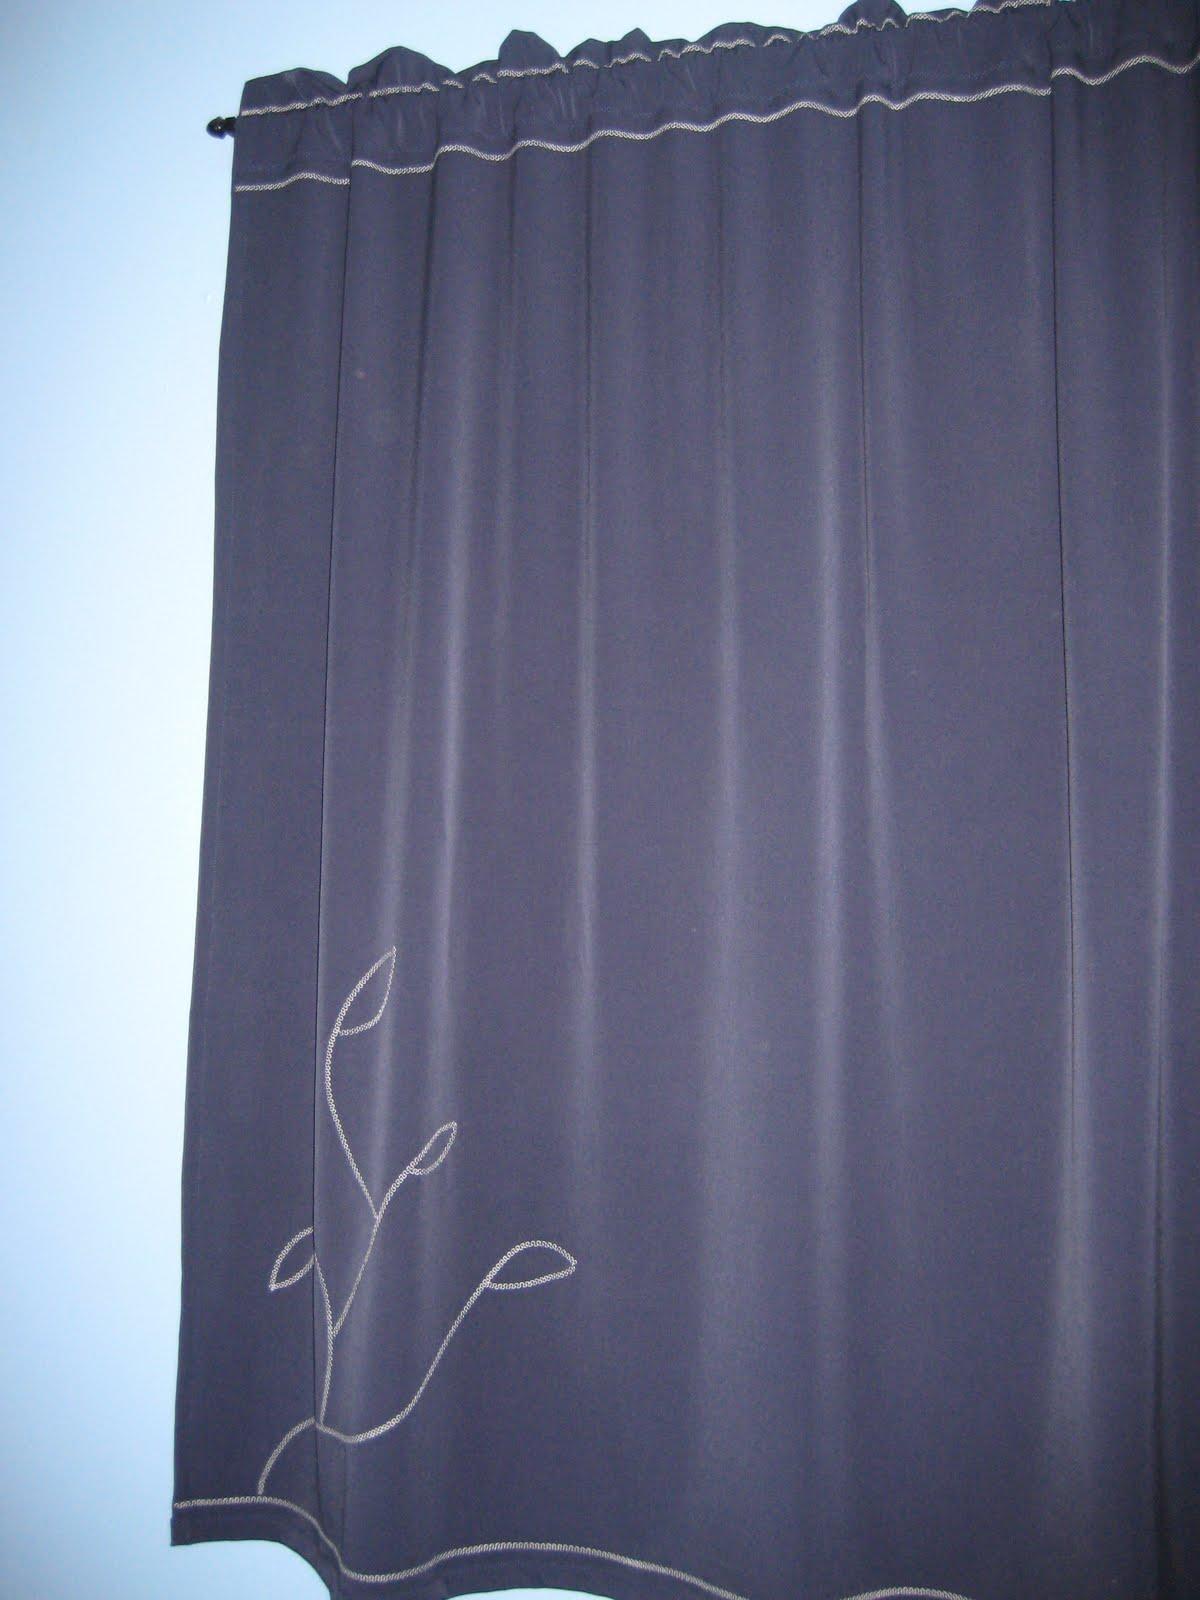 chez lili almofadas e cortina coussins et rideaux. Black Bedroom Furniture Sets. Home Design Ideas